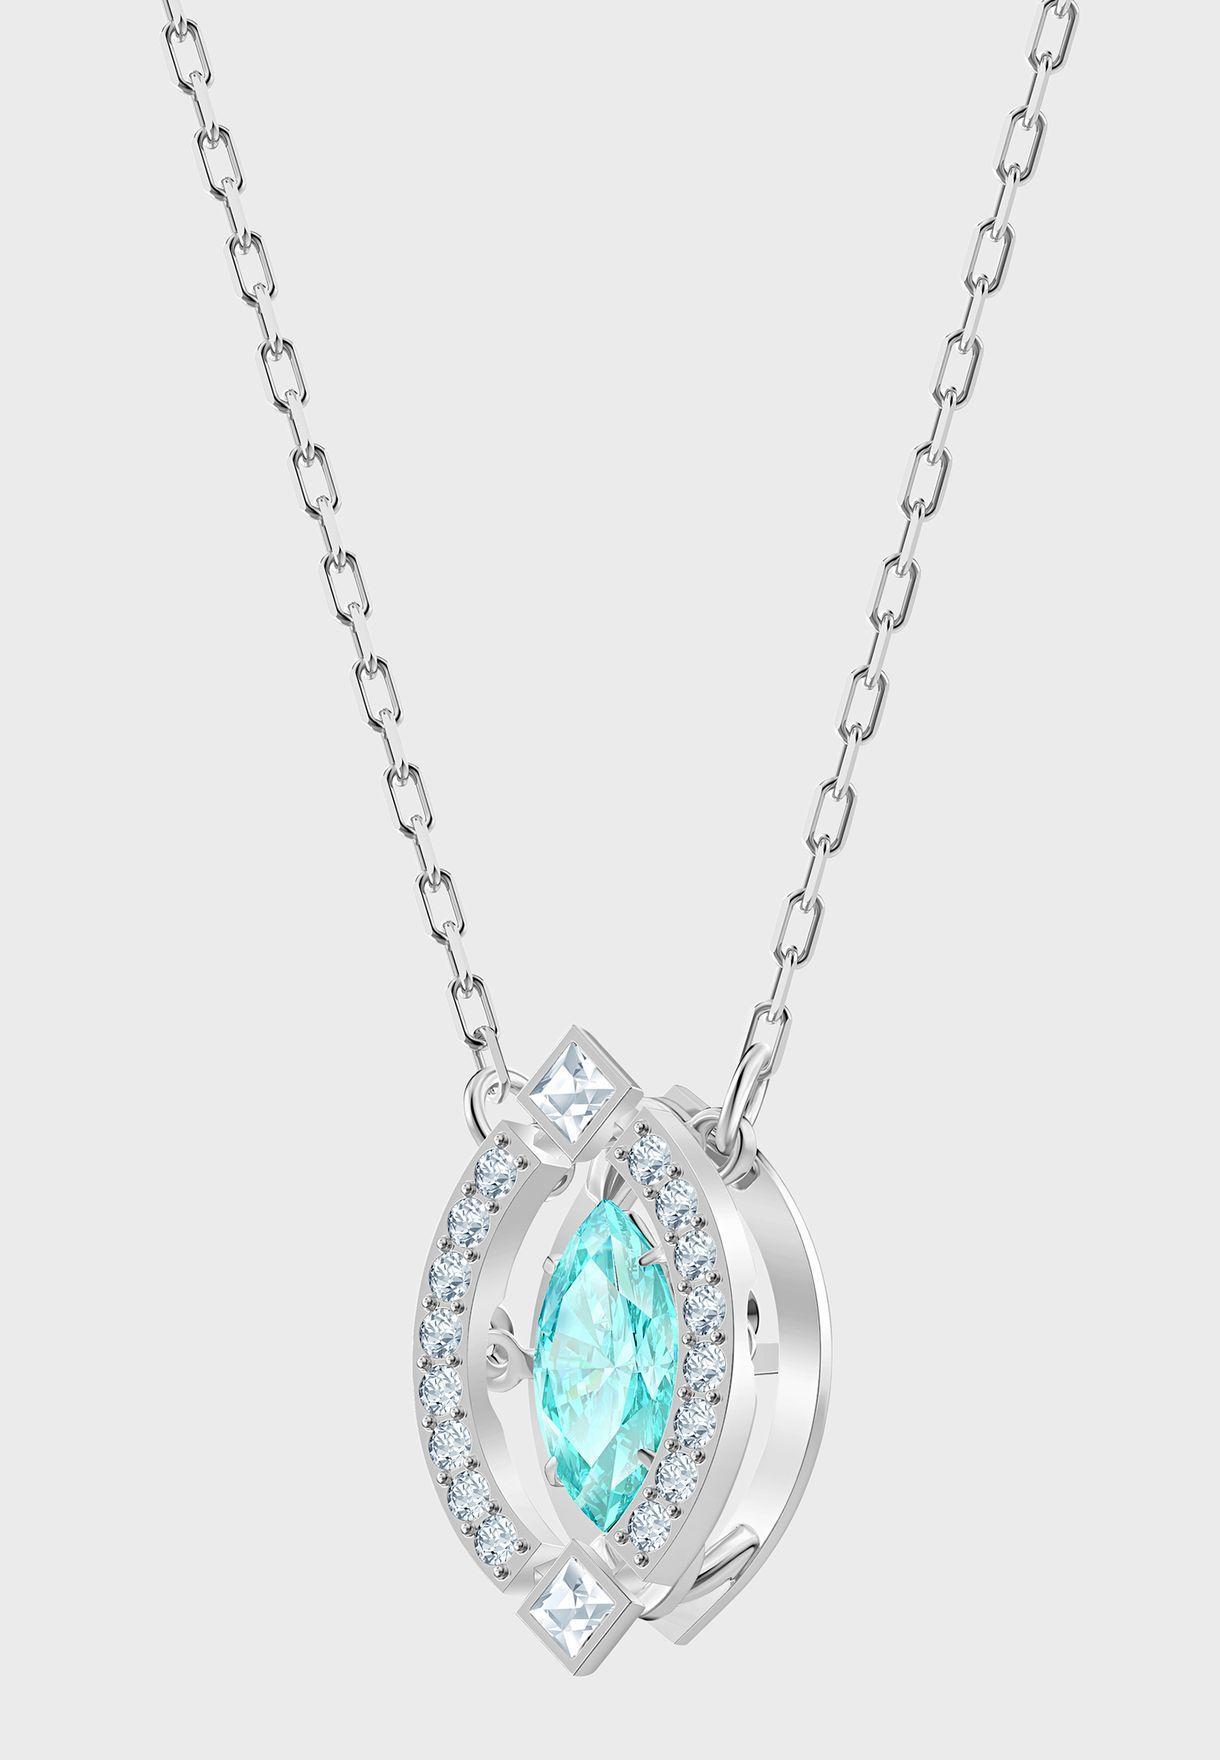 Sparkling Marq Pendant Necklace